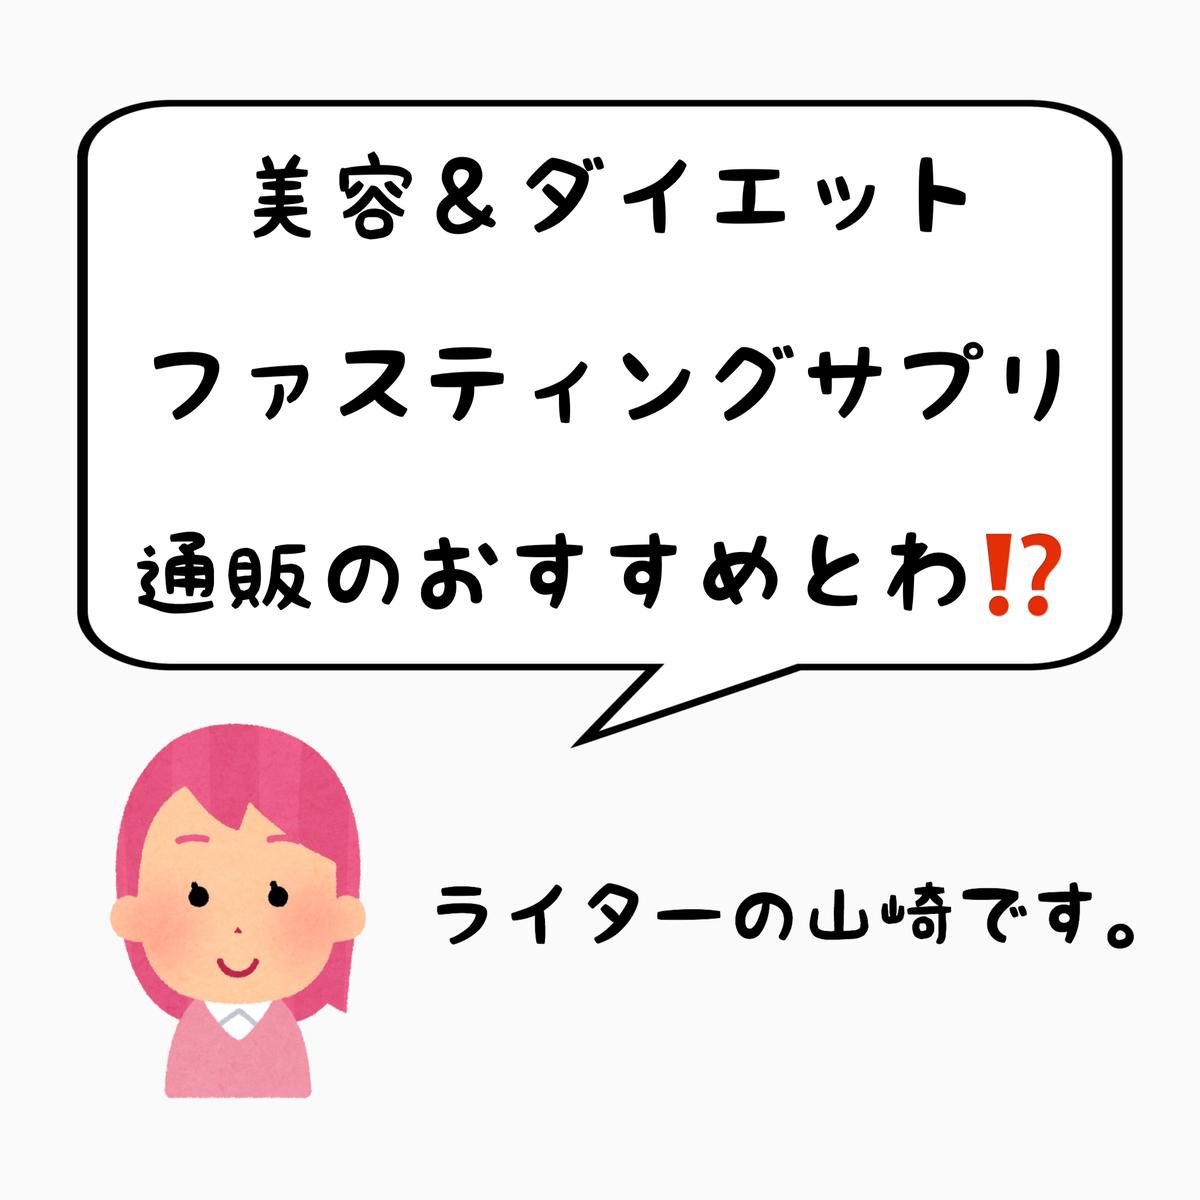 f:id:nokonoko_o:20201109164840j:plain